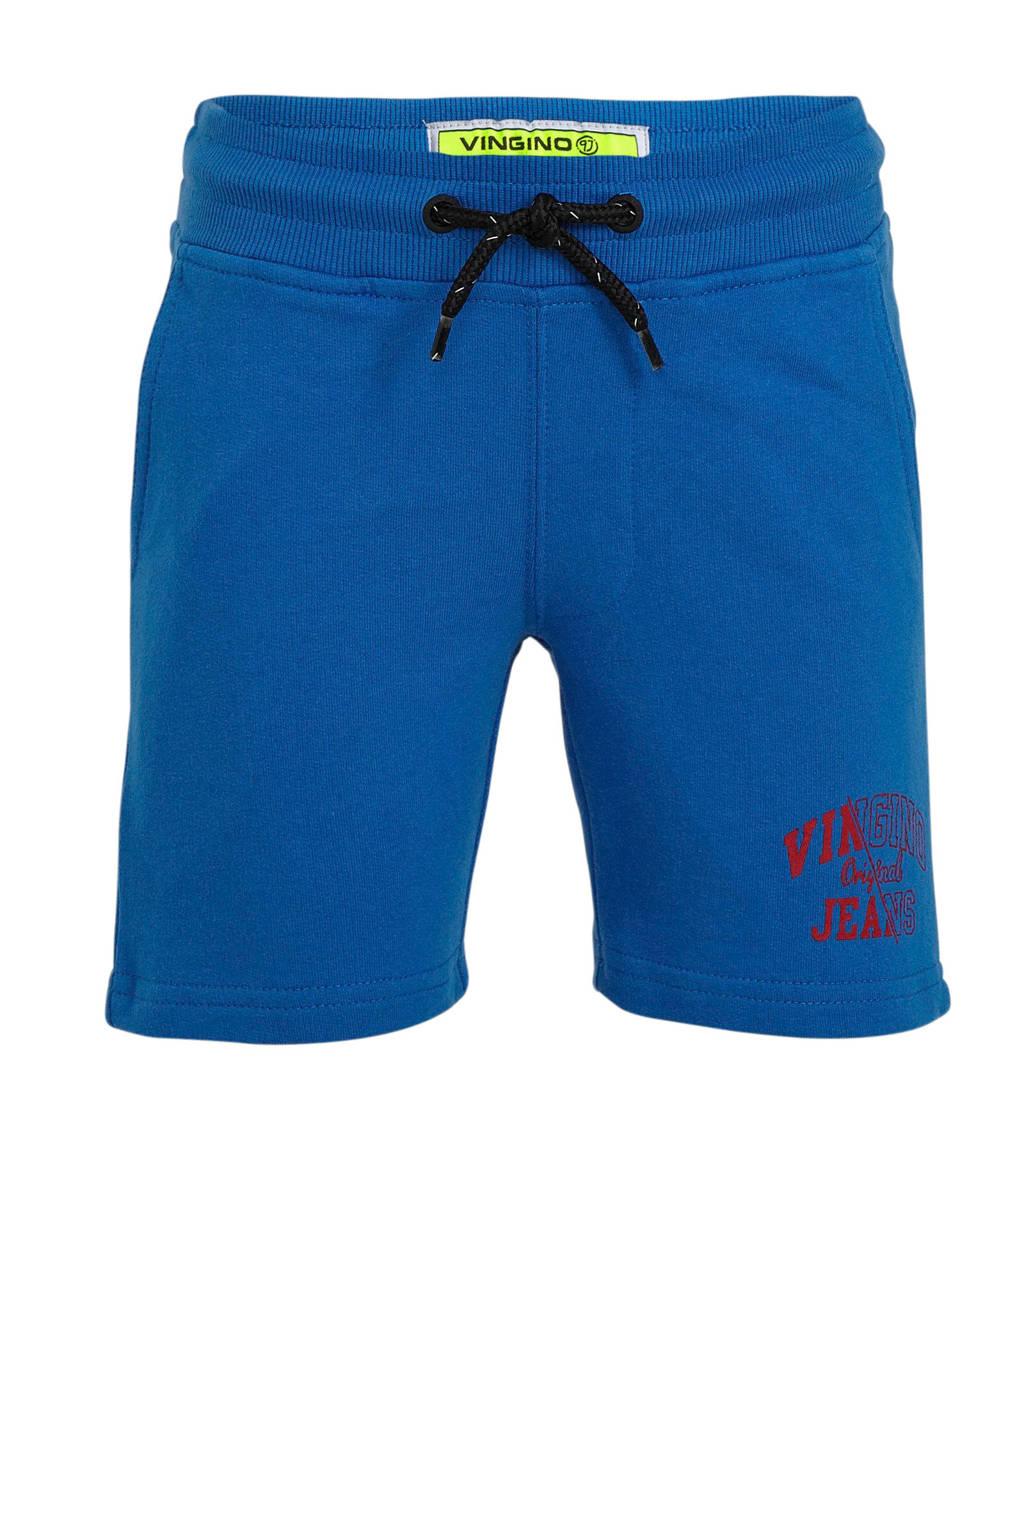 Vingino sweatshort Rexx met logo blauw, Blauw/rood